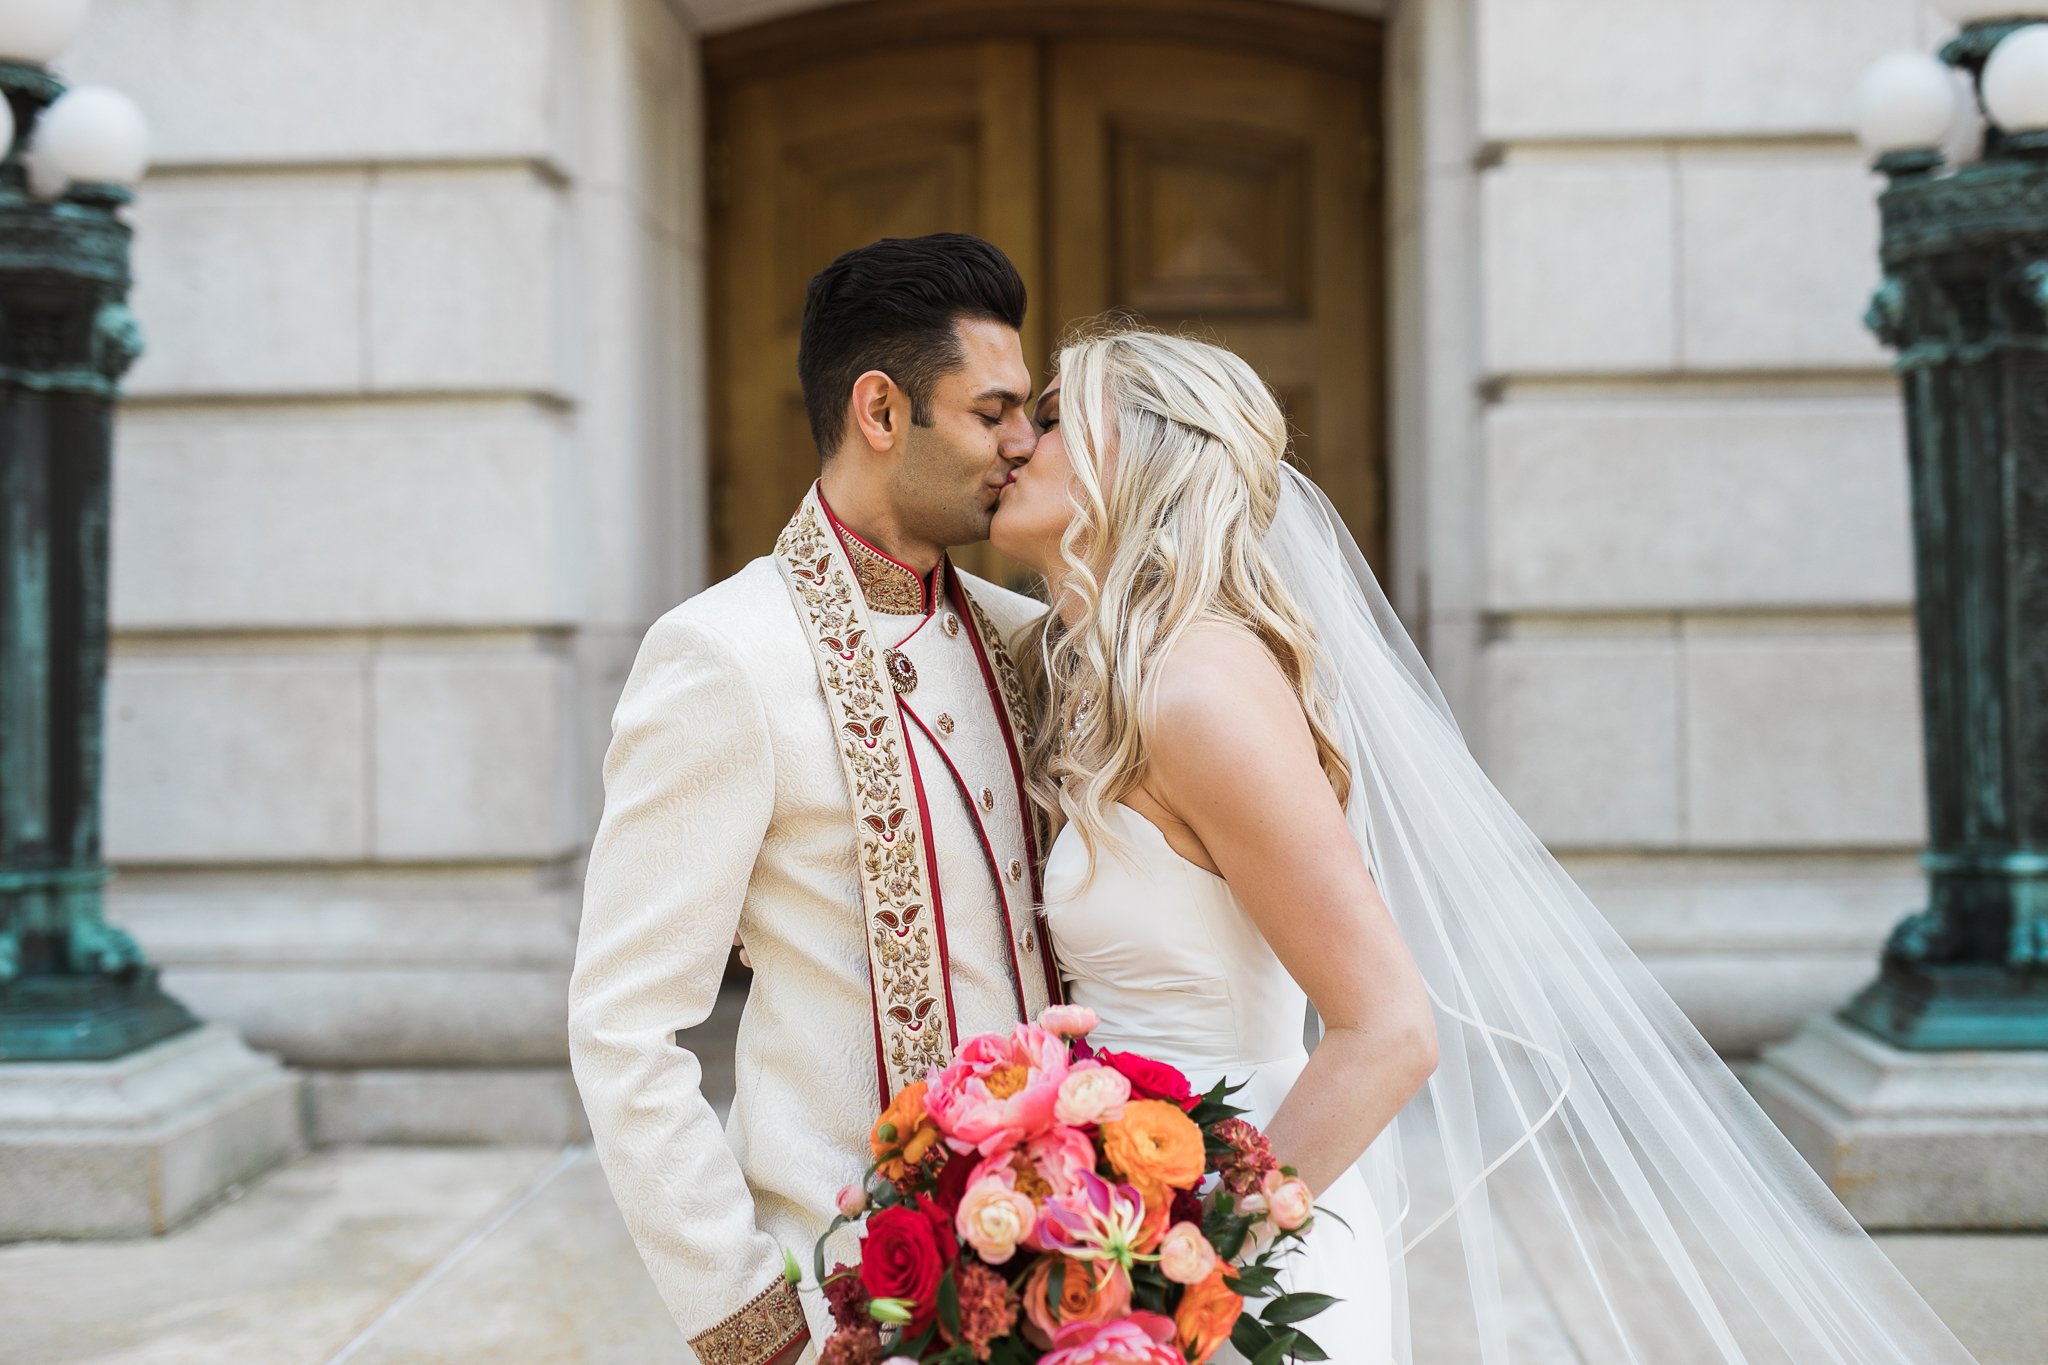 Indian-Fusion-wedding-Madison-Wisconsin_054.jpg